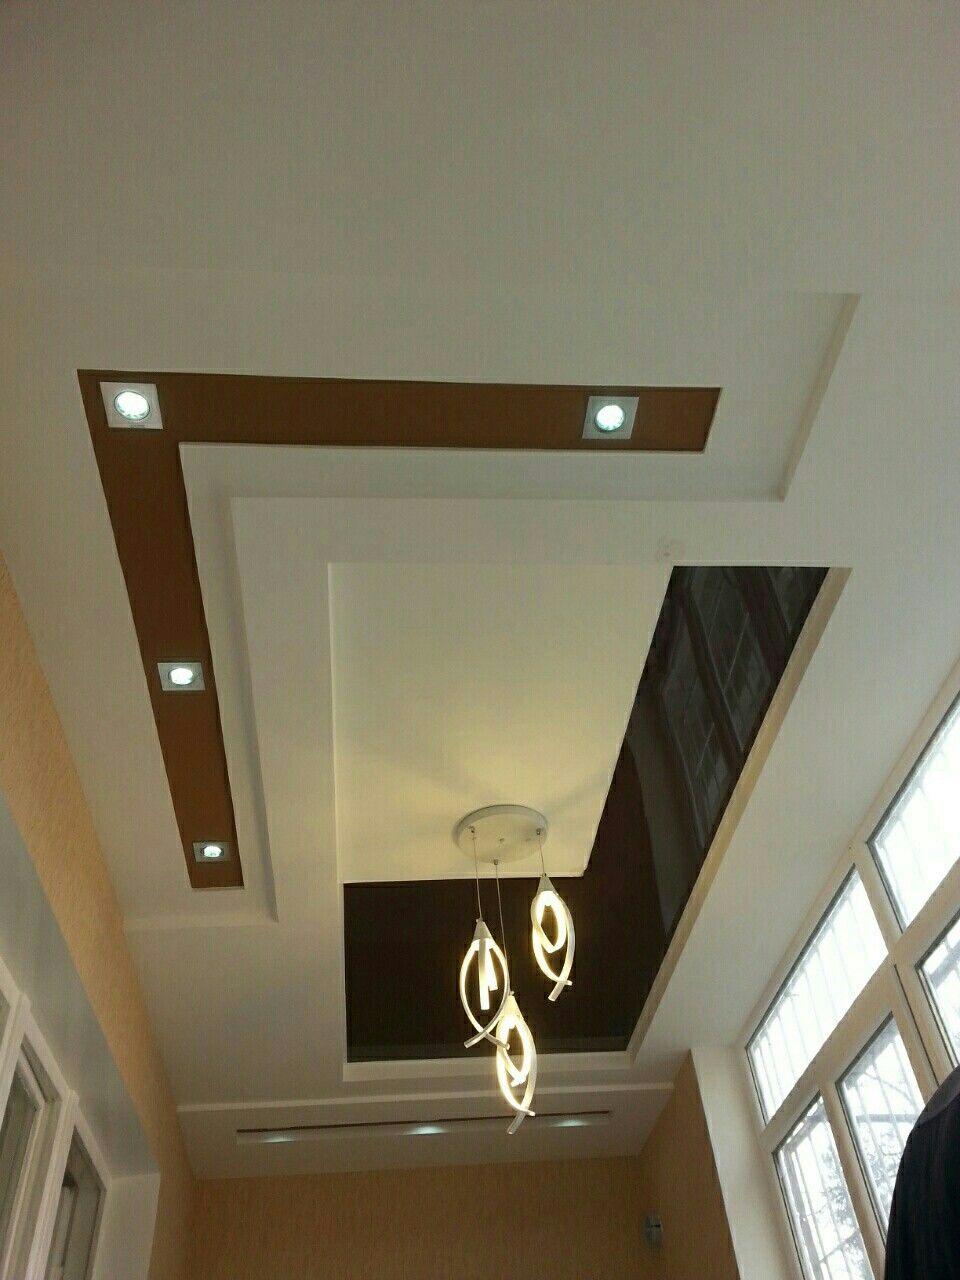 Pin By Dilpazirabbasi On False Ceiling Design In 2020 Pop False